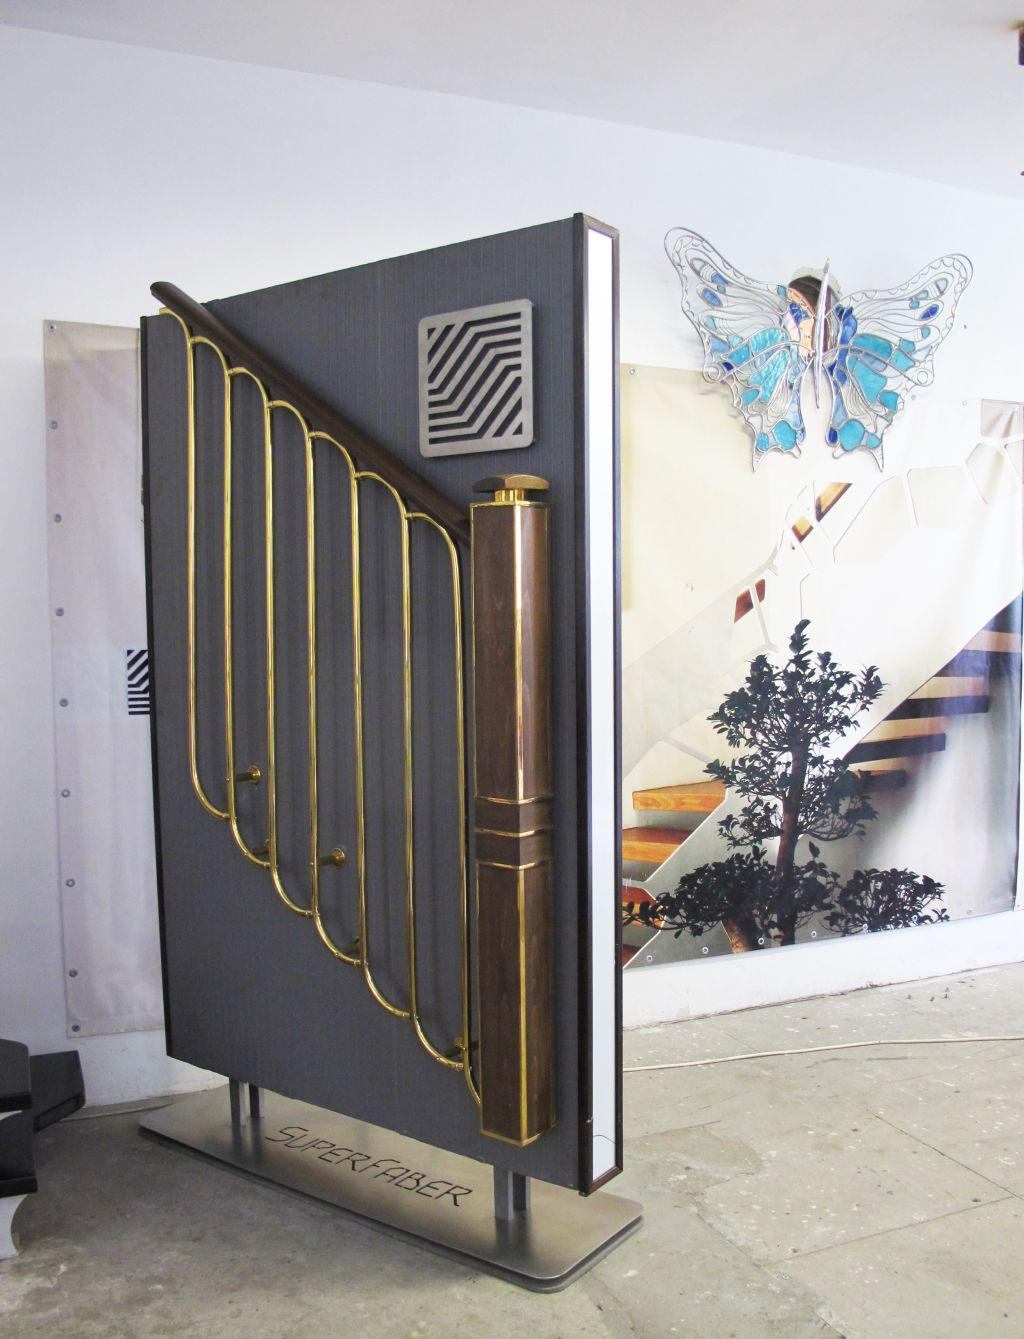 Model de balustrada si mana curenta in stil art decor de la SuperFaber